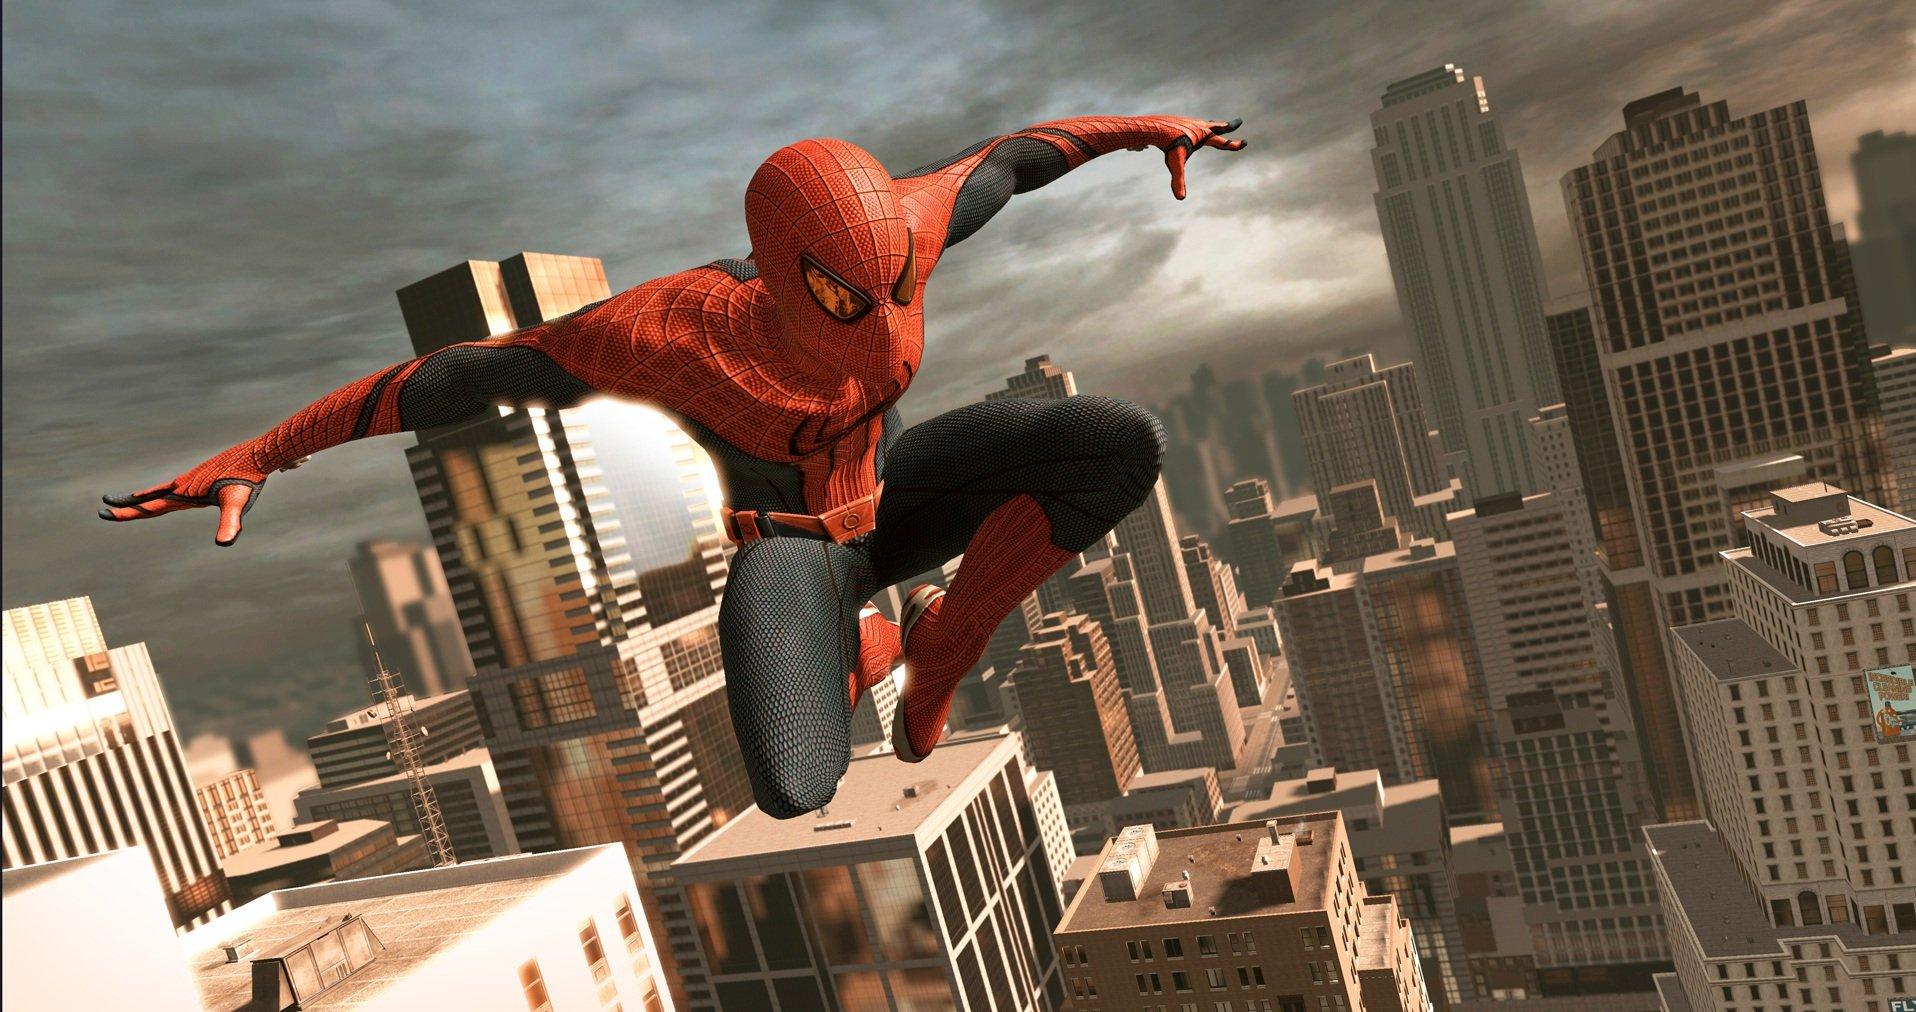 The amazing spiderman dvd poster the amazing spider-man dvd pixgoodcom